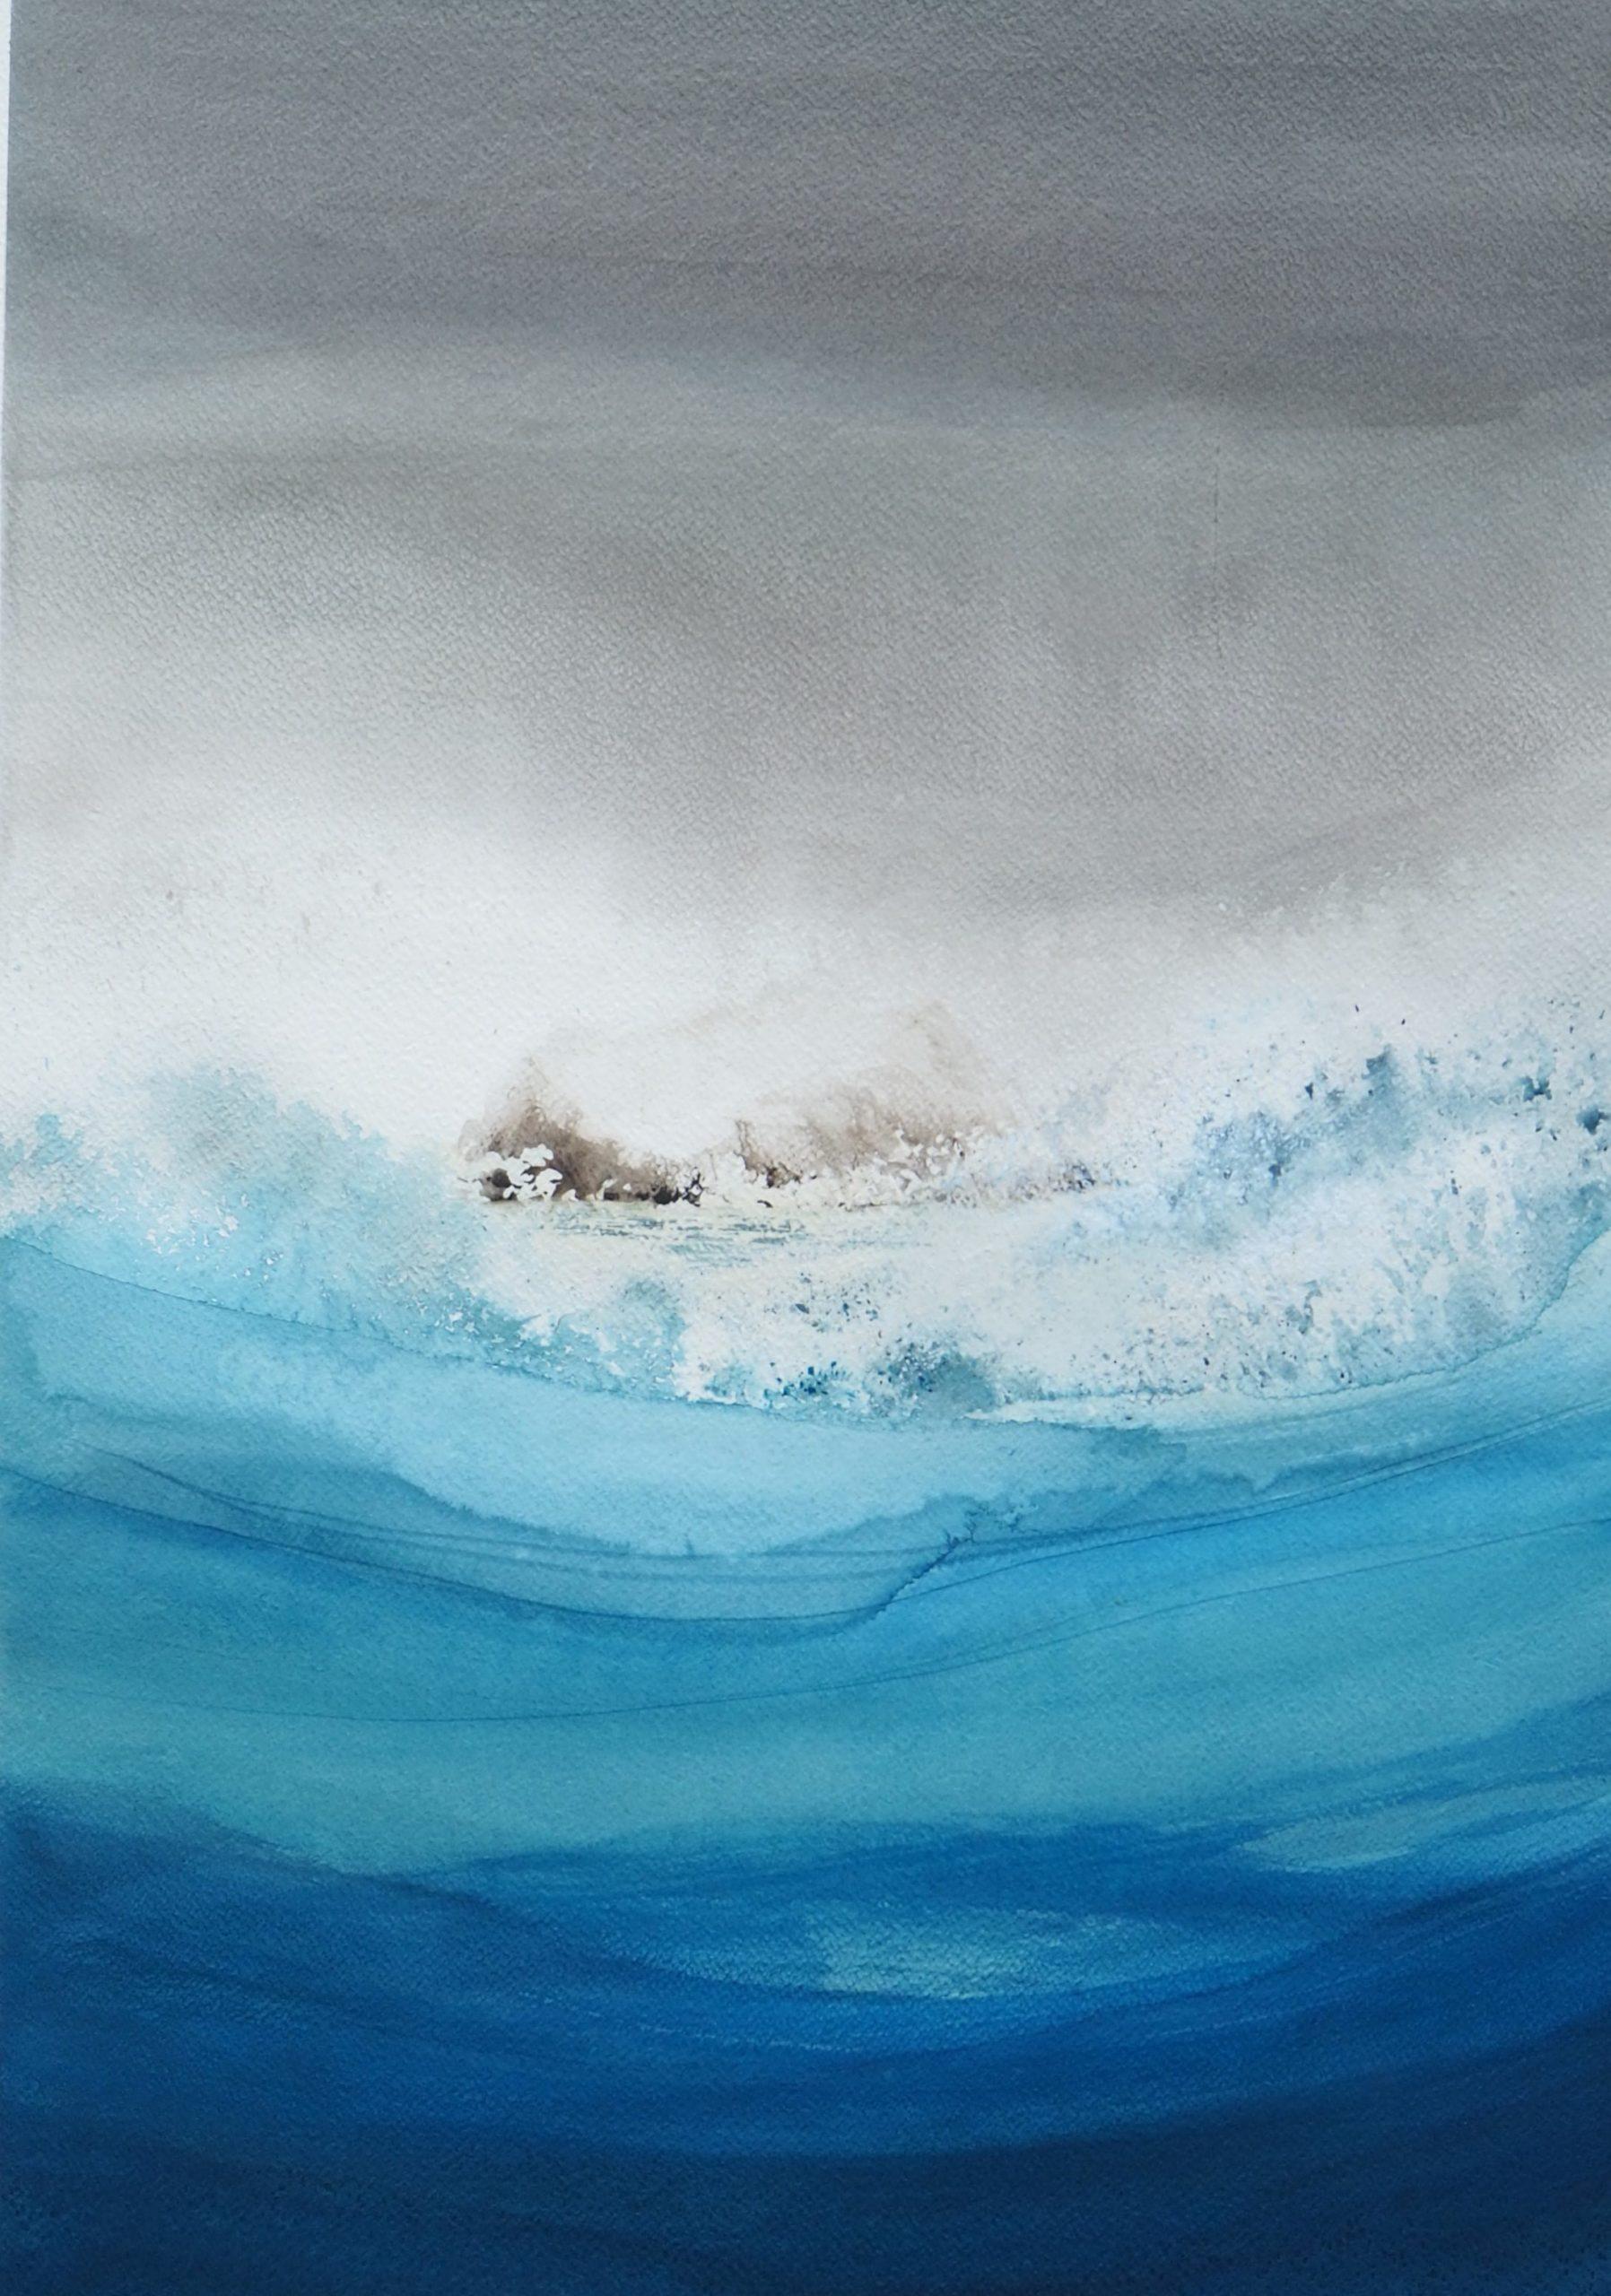 Susan Macintosh. Squall Passing, St. Kilda